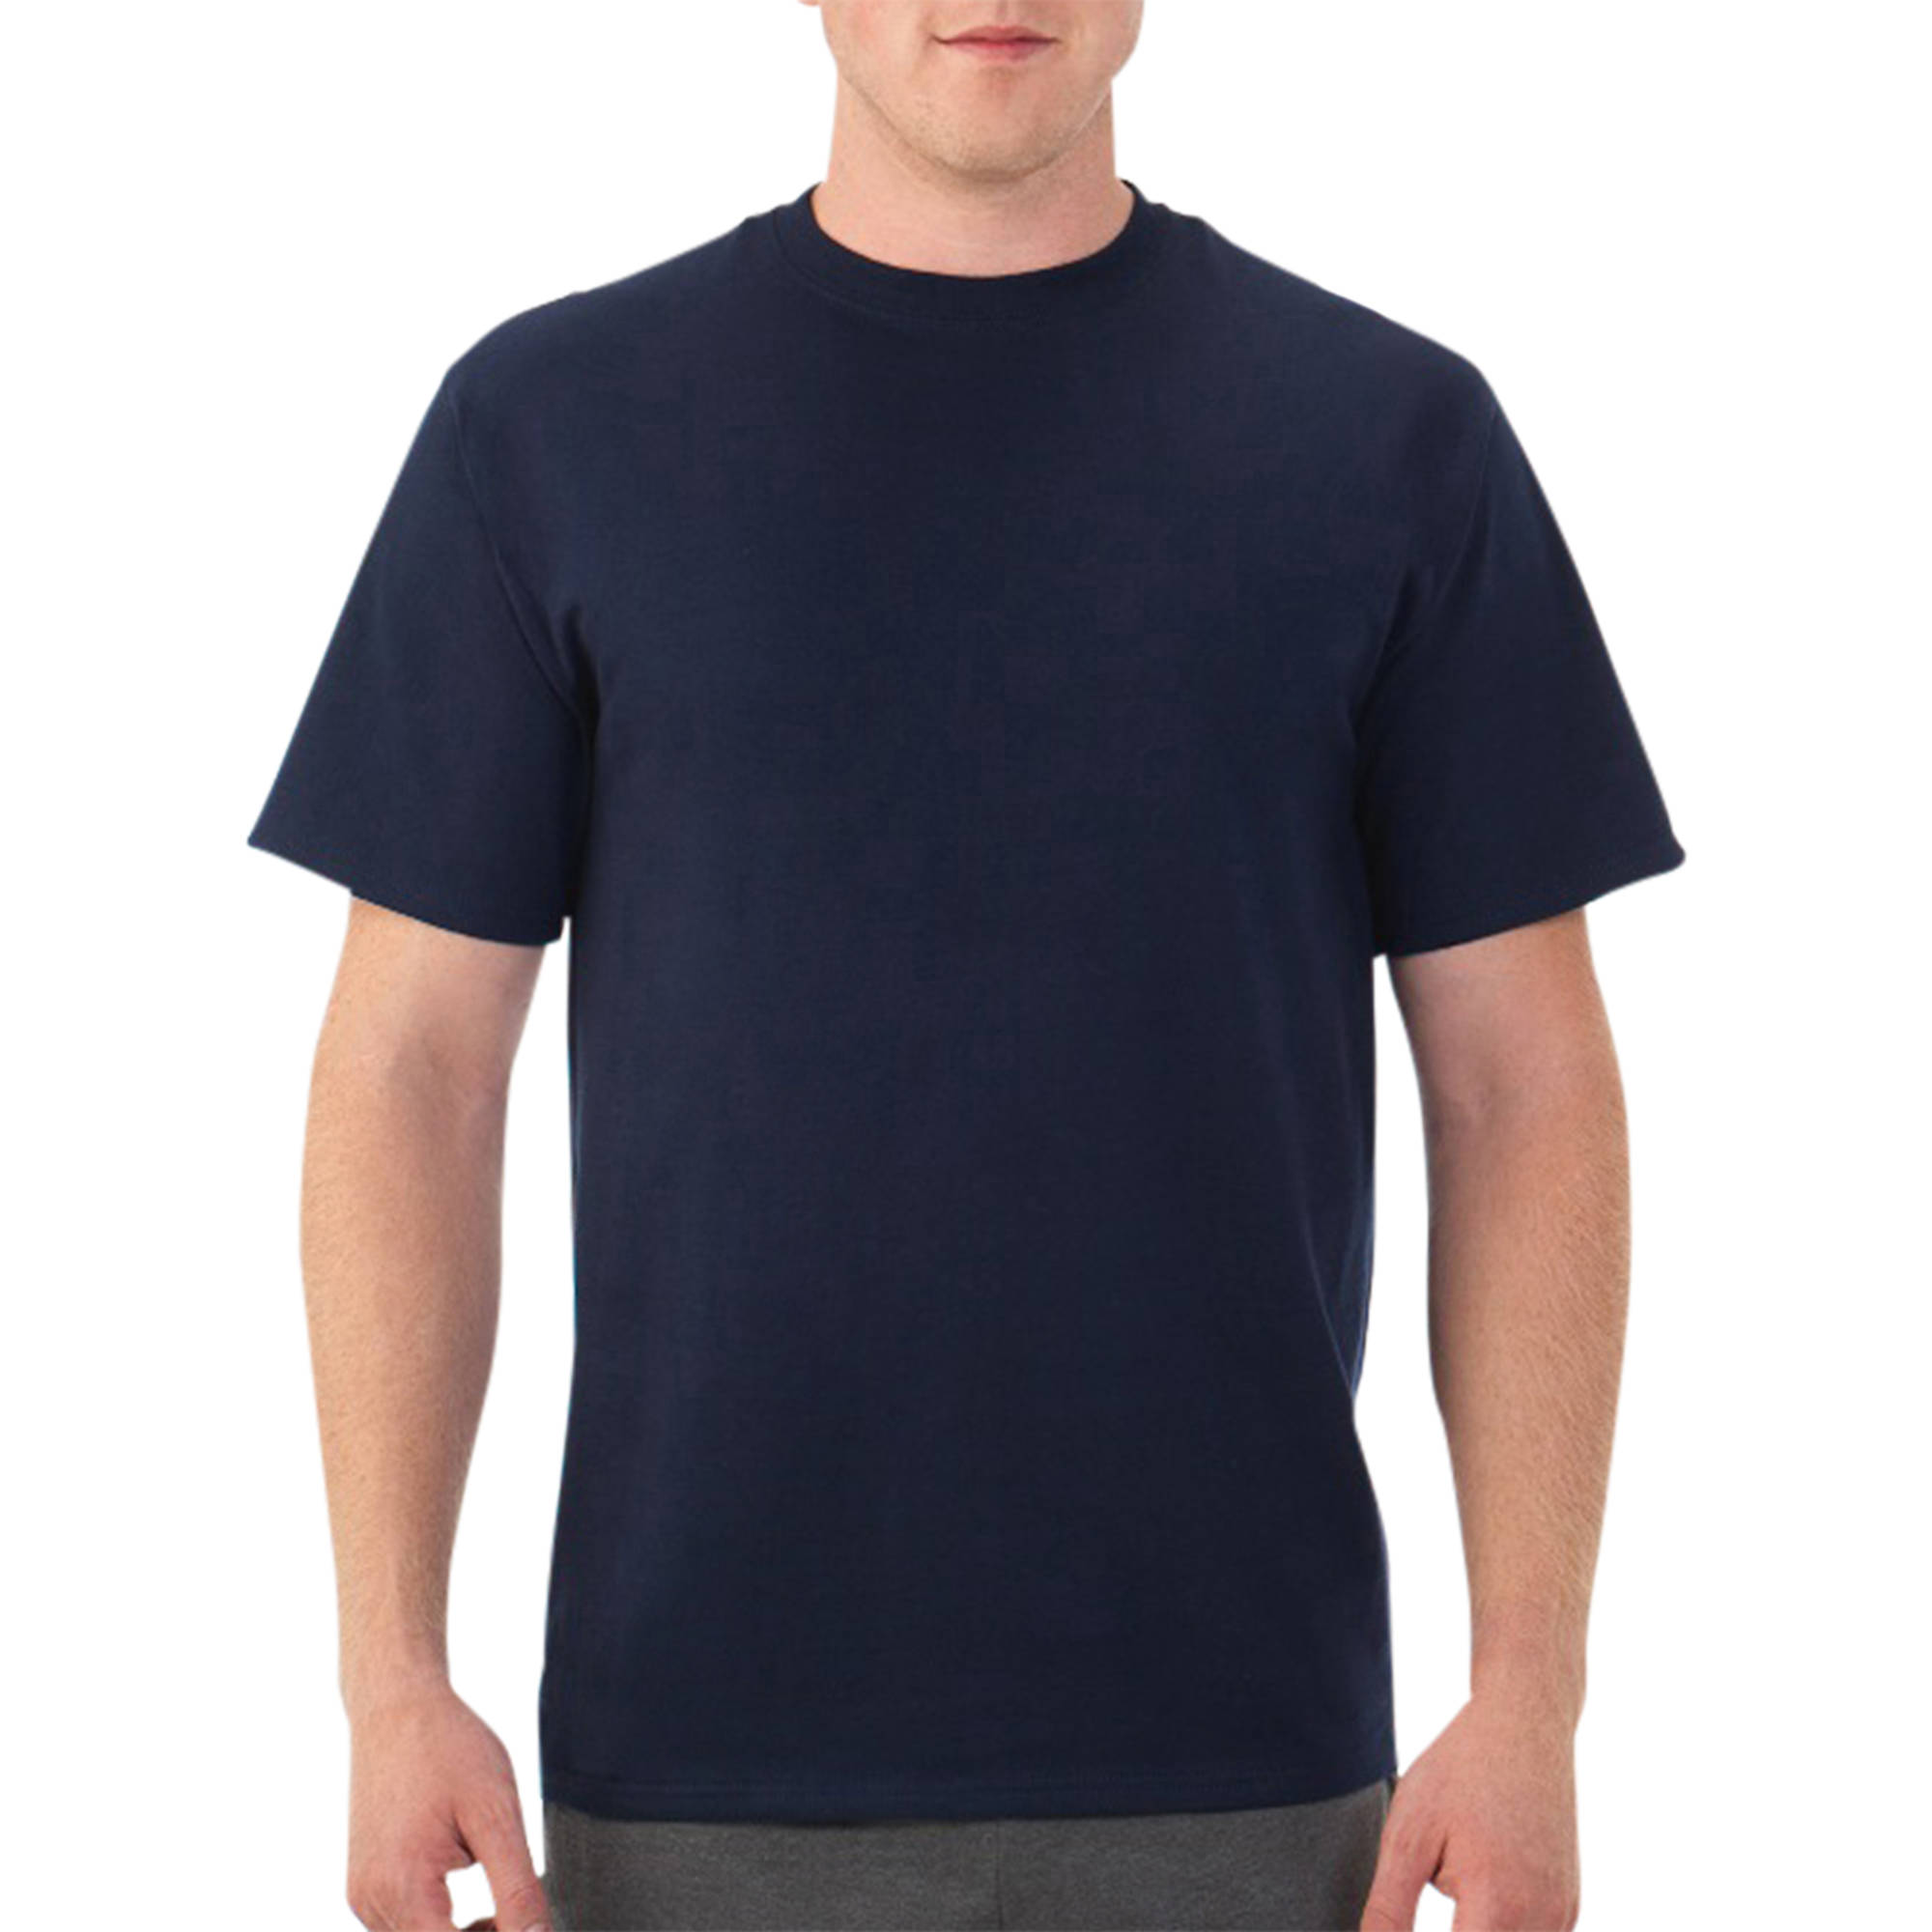 Best quality black t shirt - Best Quality Black T Shirt 30